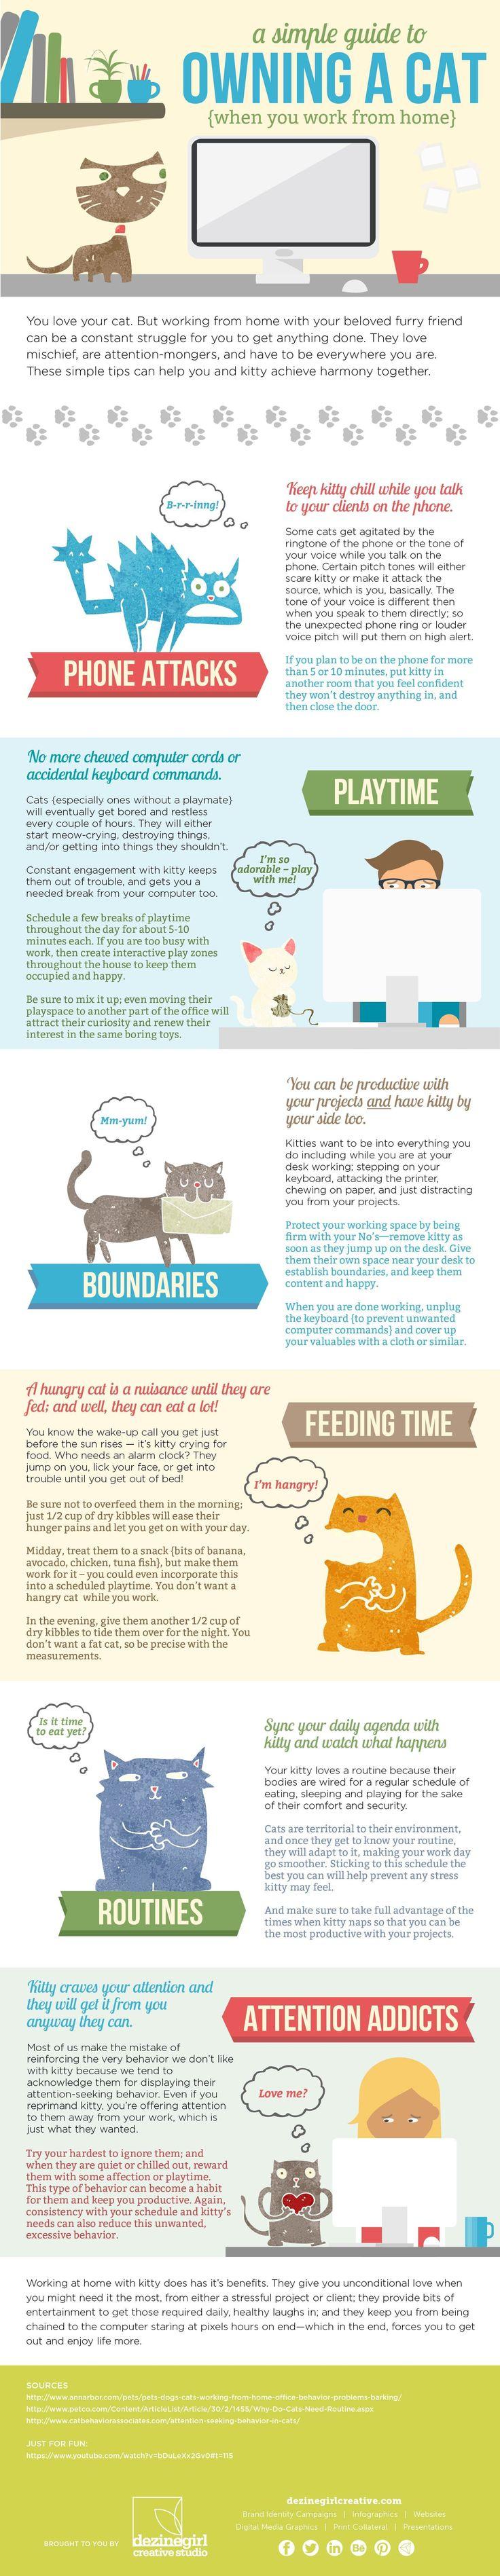 1000+ best My Ideas images by Grace on Pinterest | Business ideas ...